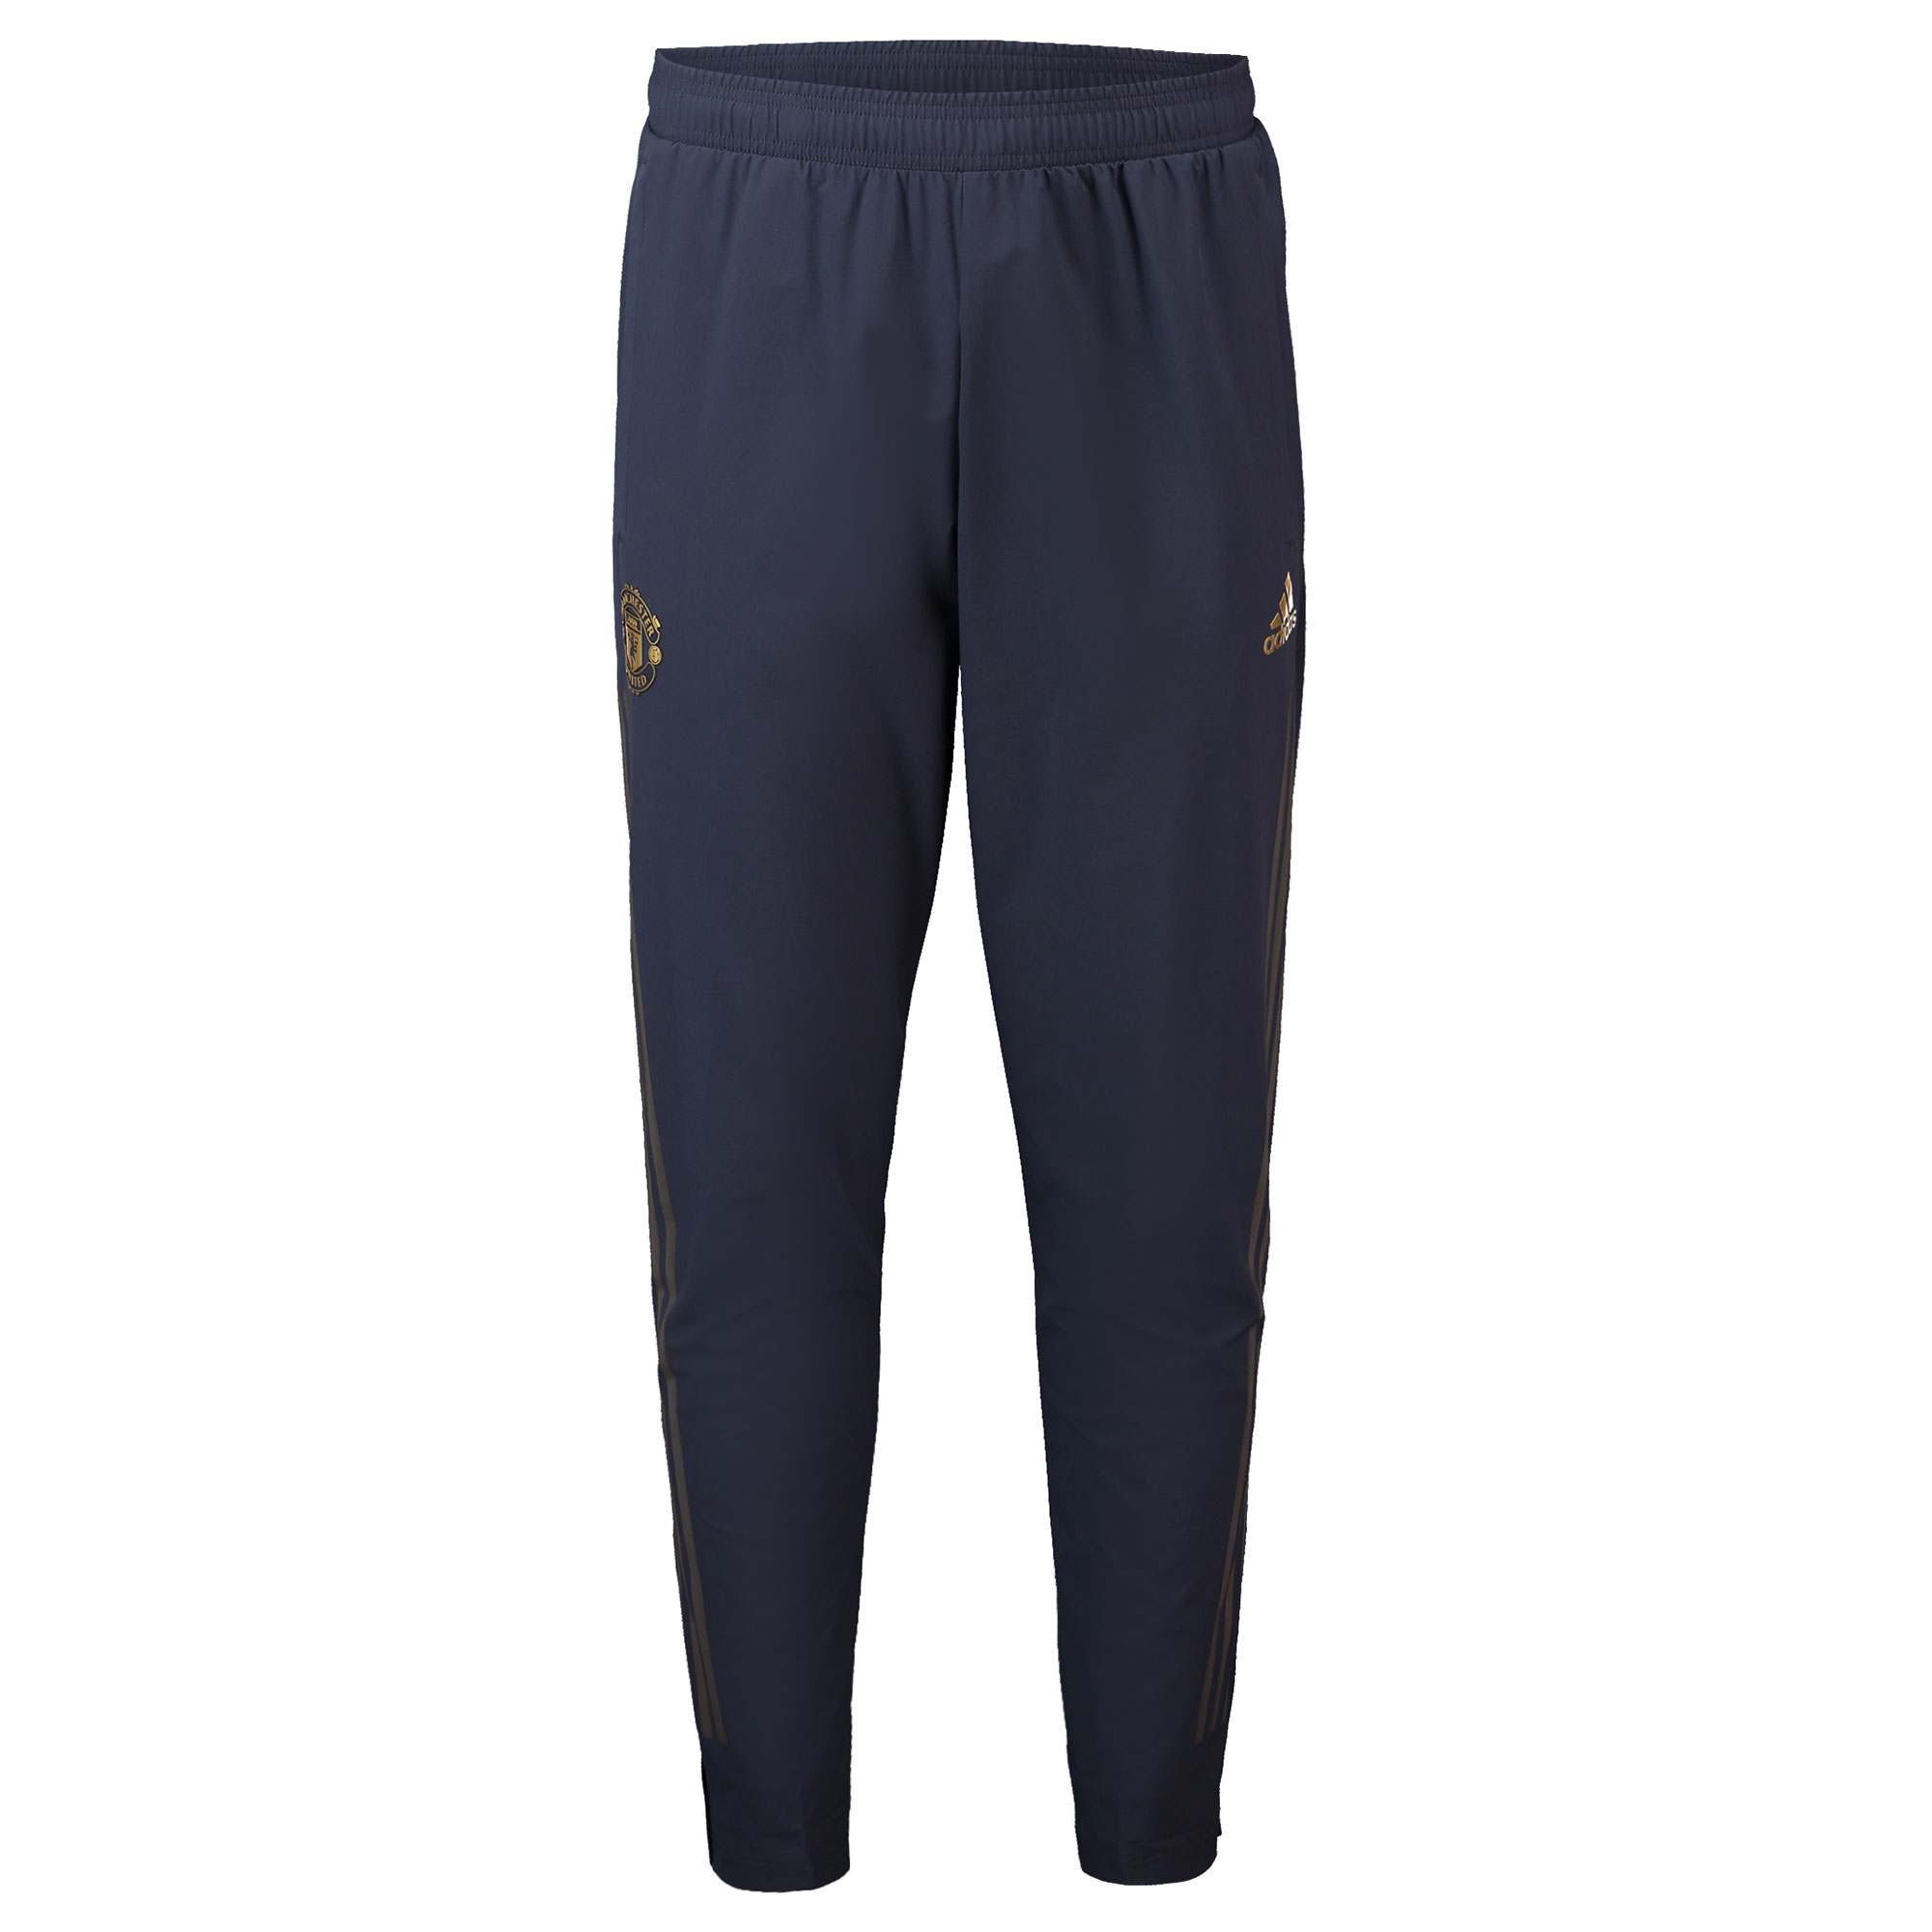 Pantalon d'entraînement UCL Manchester United - Bleu marine